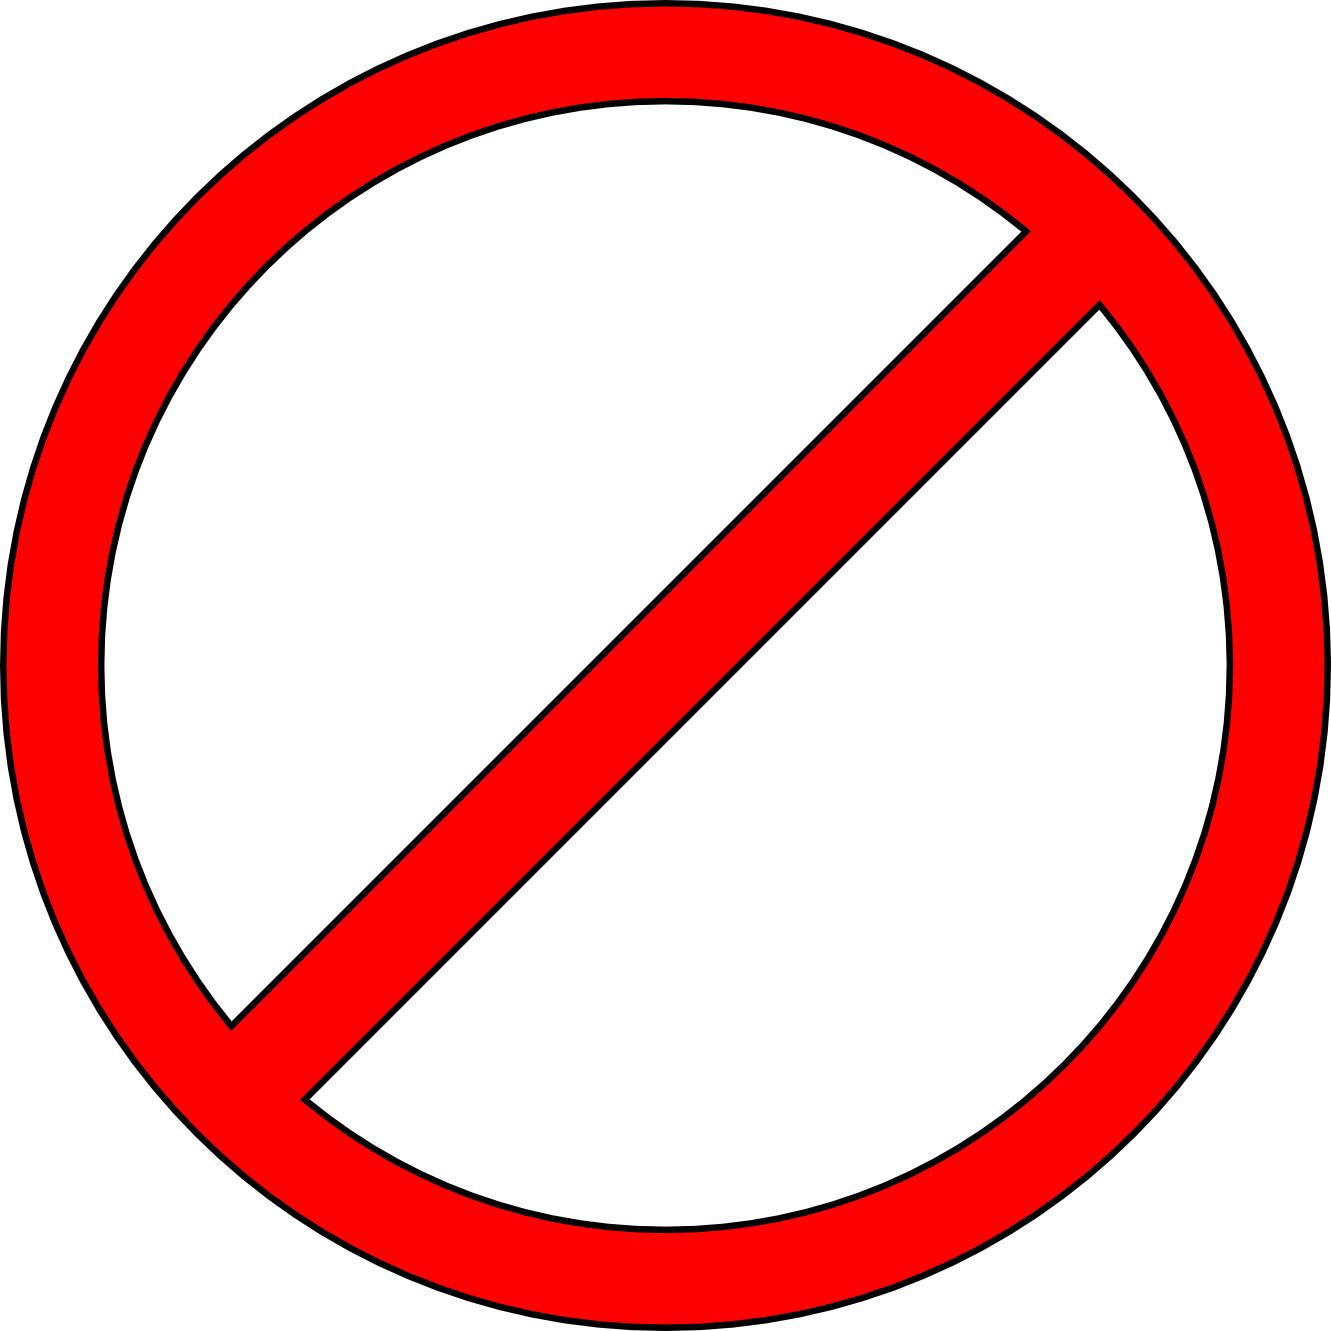 Do Not Symbol Clip Art N4 free image.